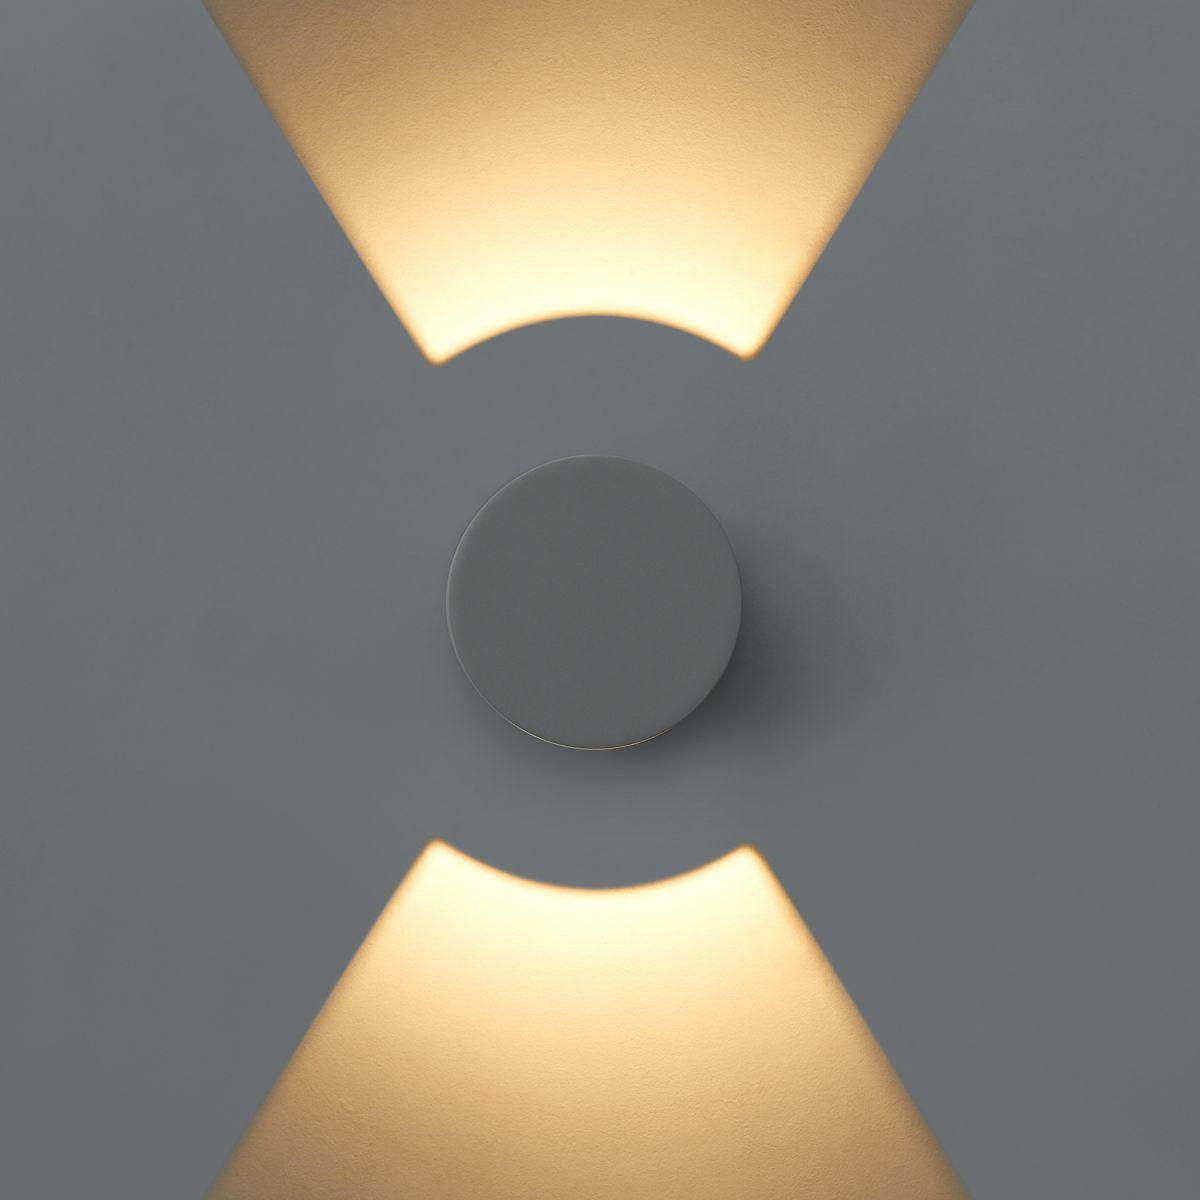 Mini DADOS Round 2 Wall Up/Down Light